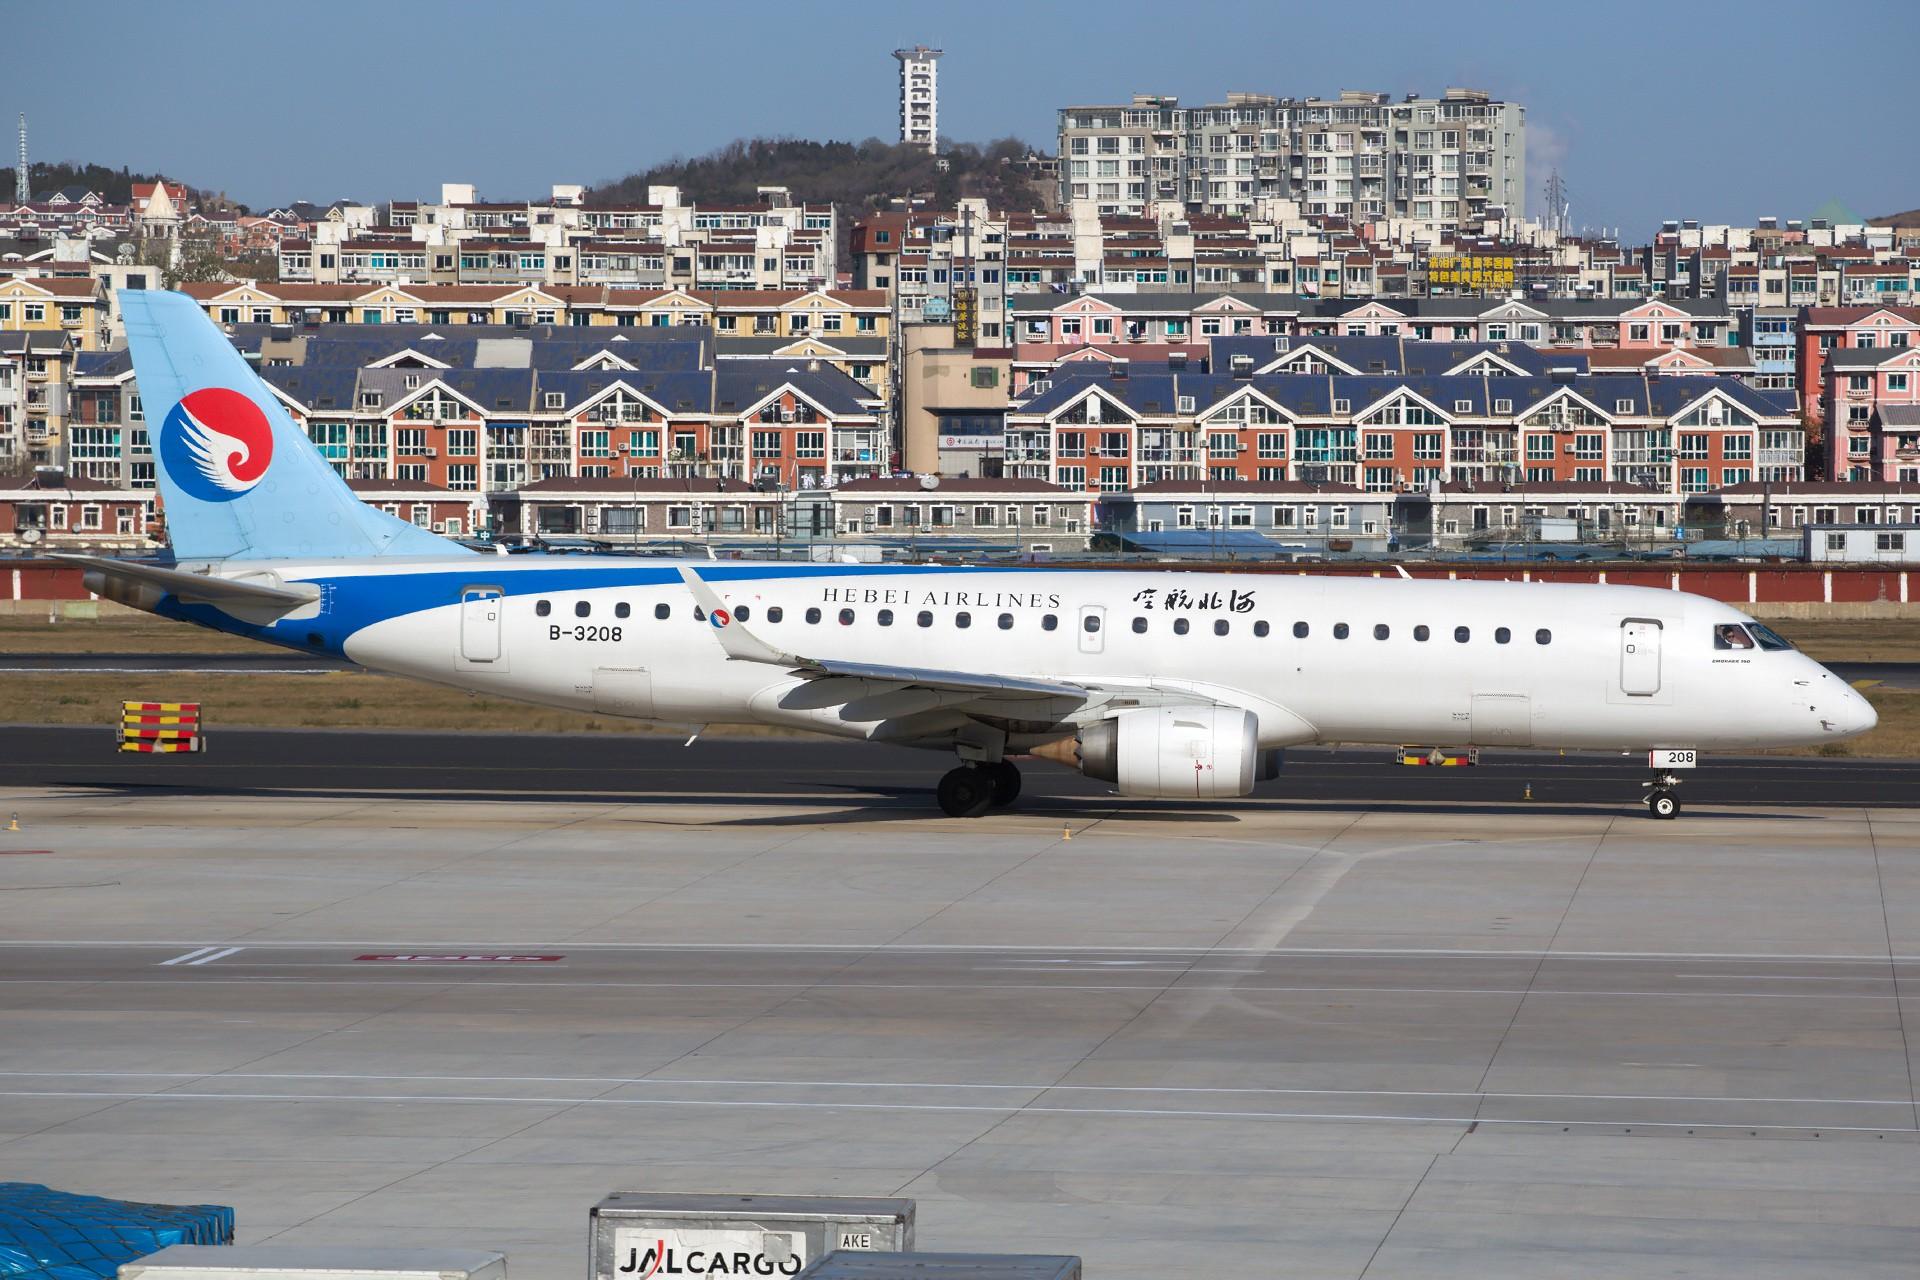 Re:[原创][DLC]。。。 杂图。。。 EMBRAER E-190 B-3208 中国大连国际机场